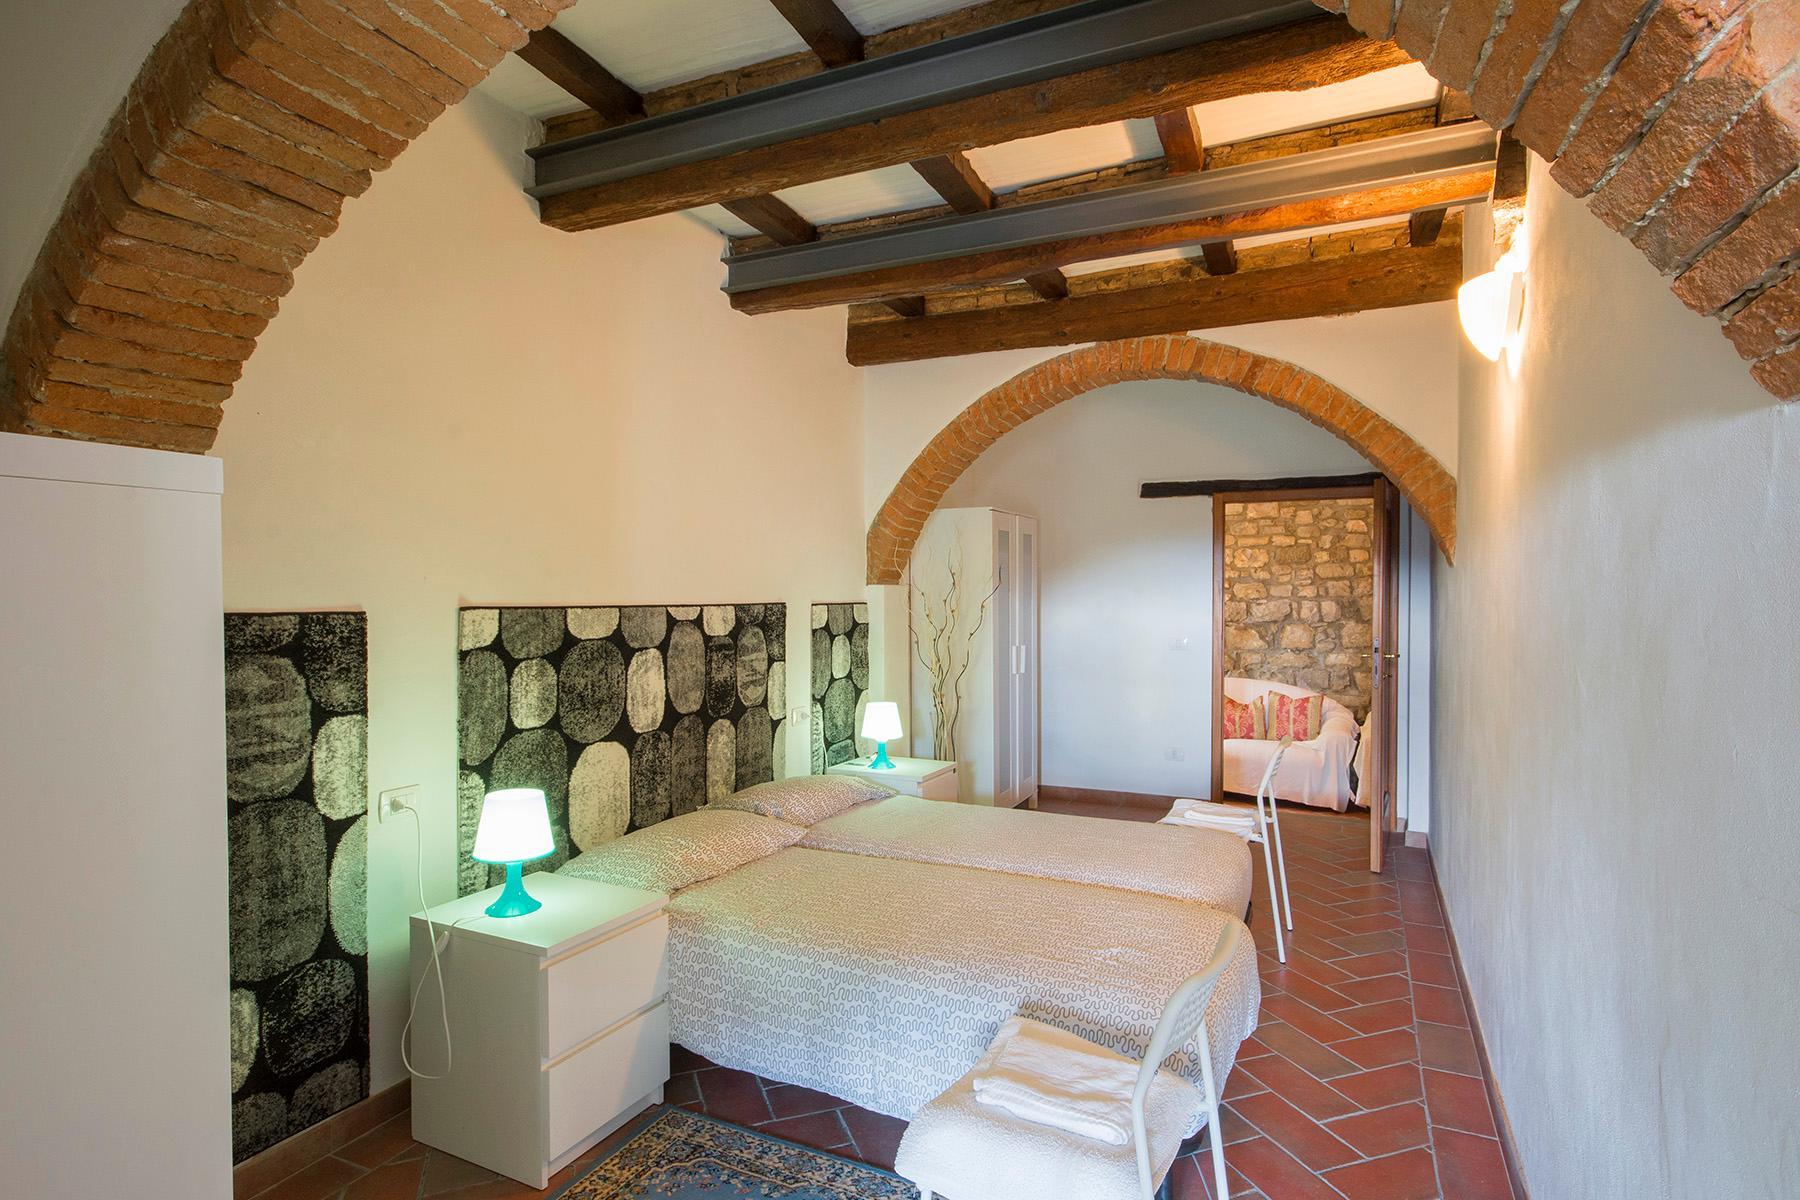 Villa charmante dans dans la Val di Sieve - 14